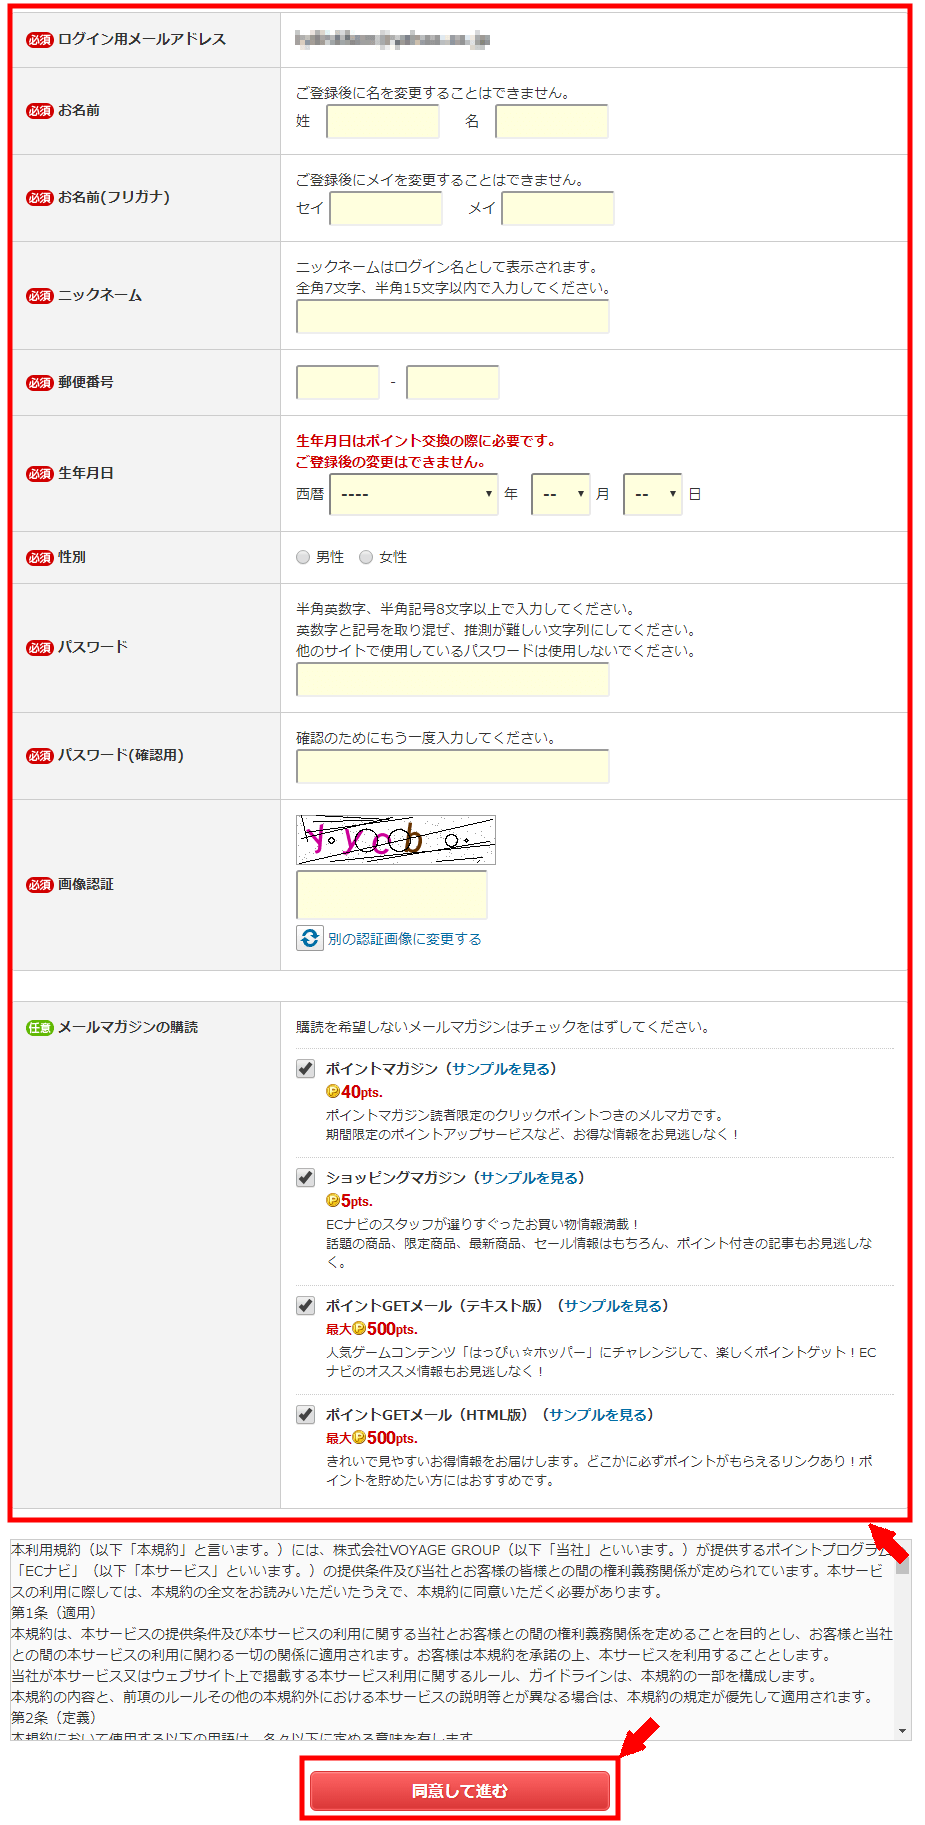 ECナビの無料会員登録の仕方3 (3)